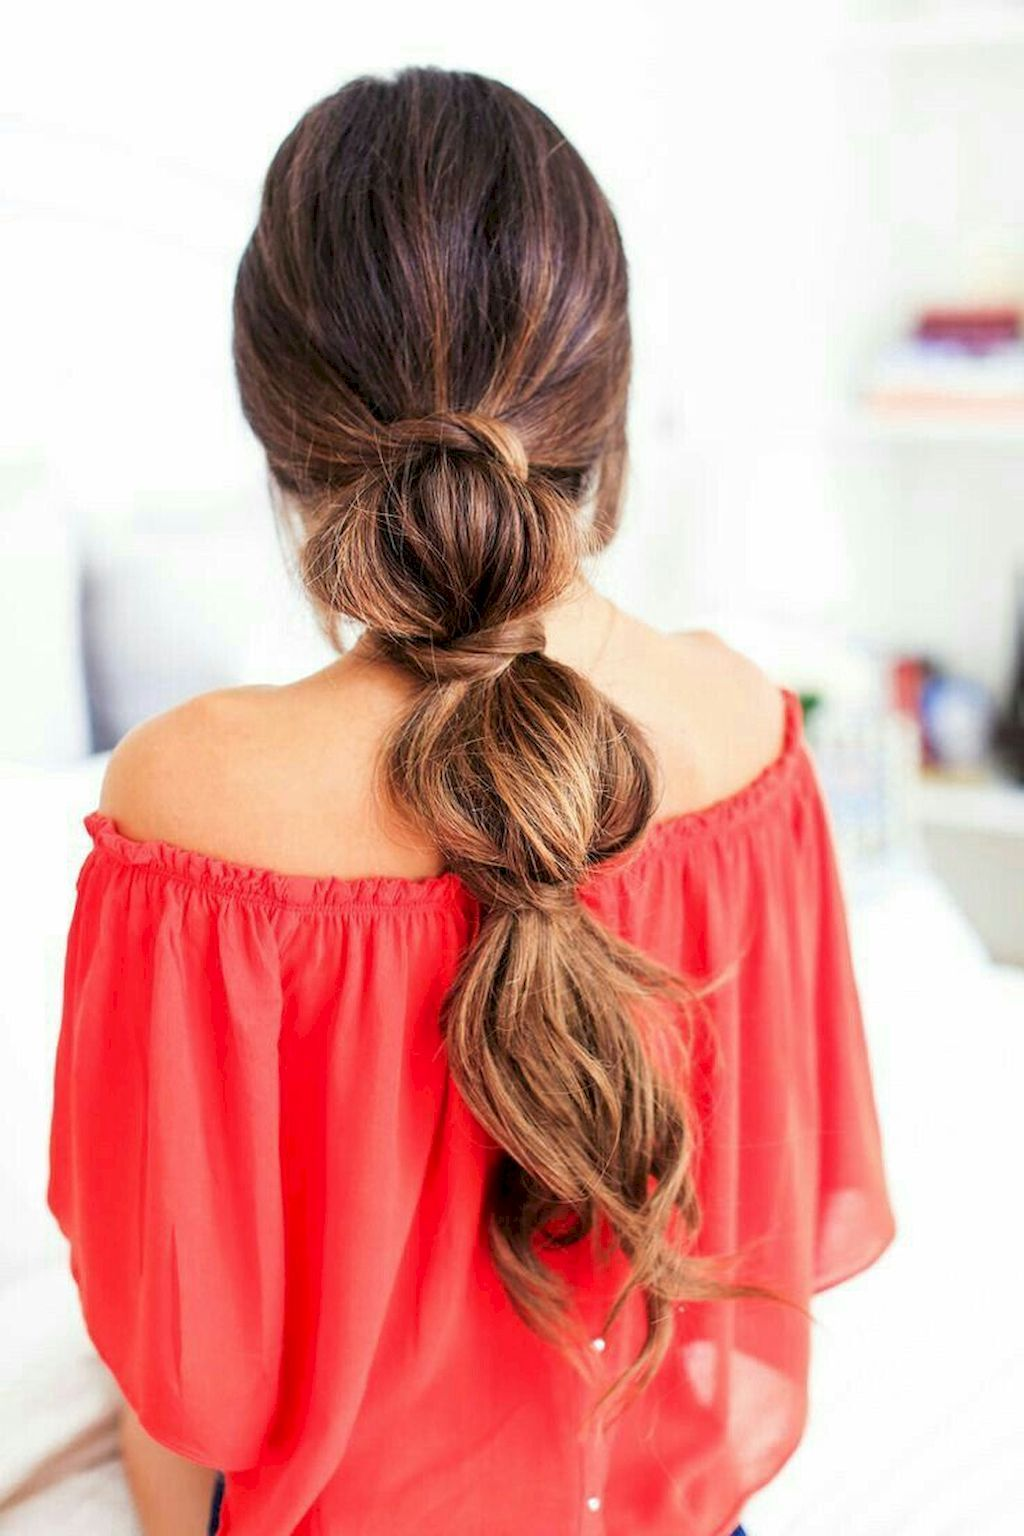 Hair Inspiration 2019-07-03 16:36:00